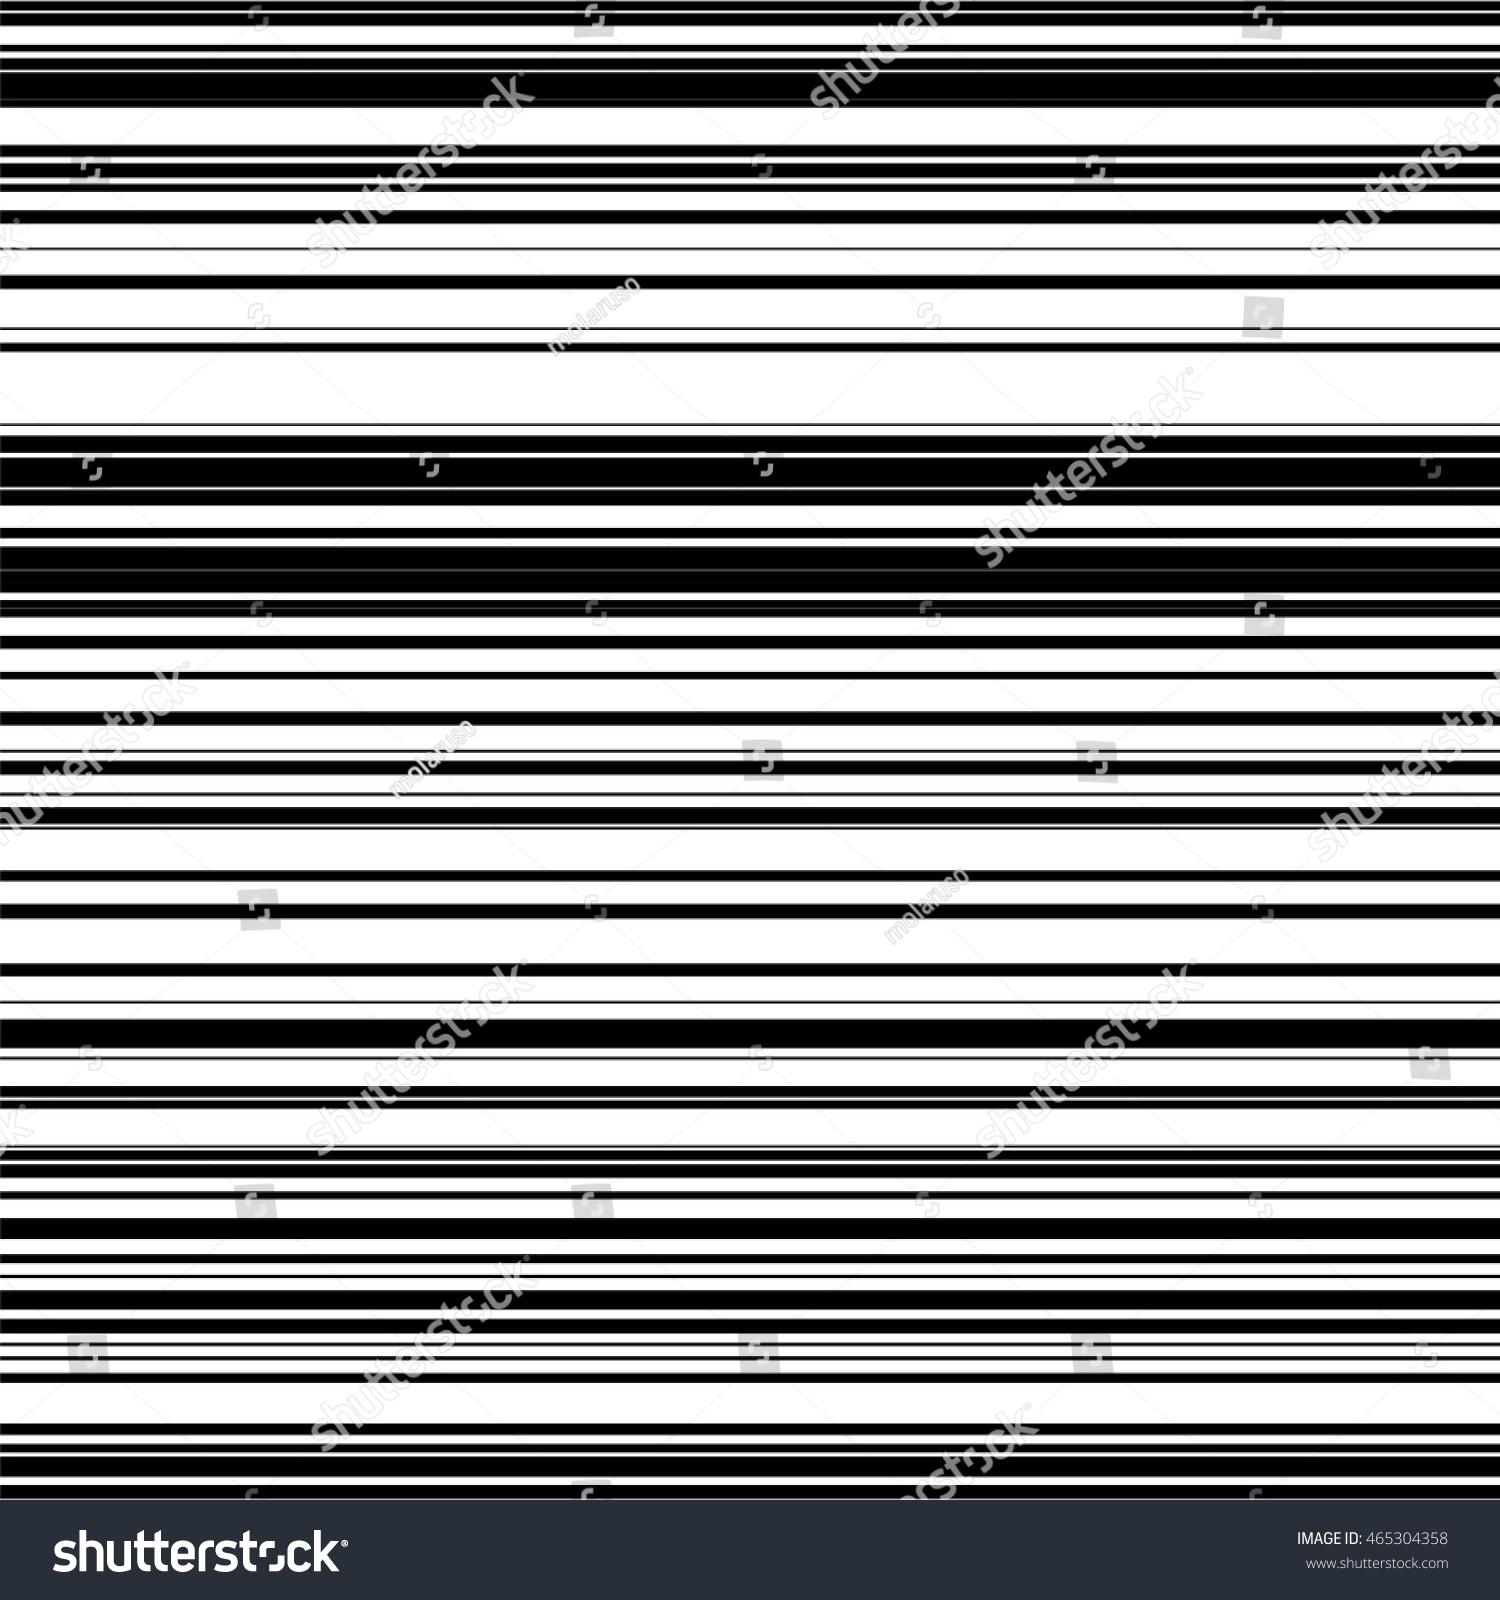 Vertical lines stripes 4 pixel line width 8 pixel line spacing grey - Horizontal Lines Stripes 1 Pixel Line Width 32 Pixel Line Spacing Line Spacing Purple And